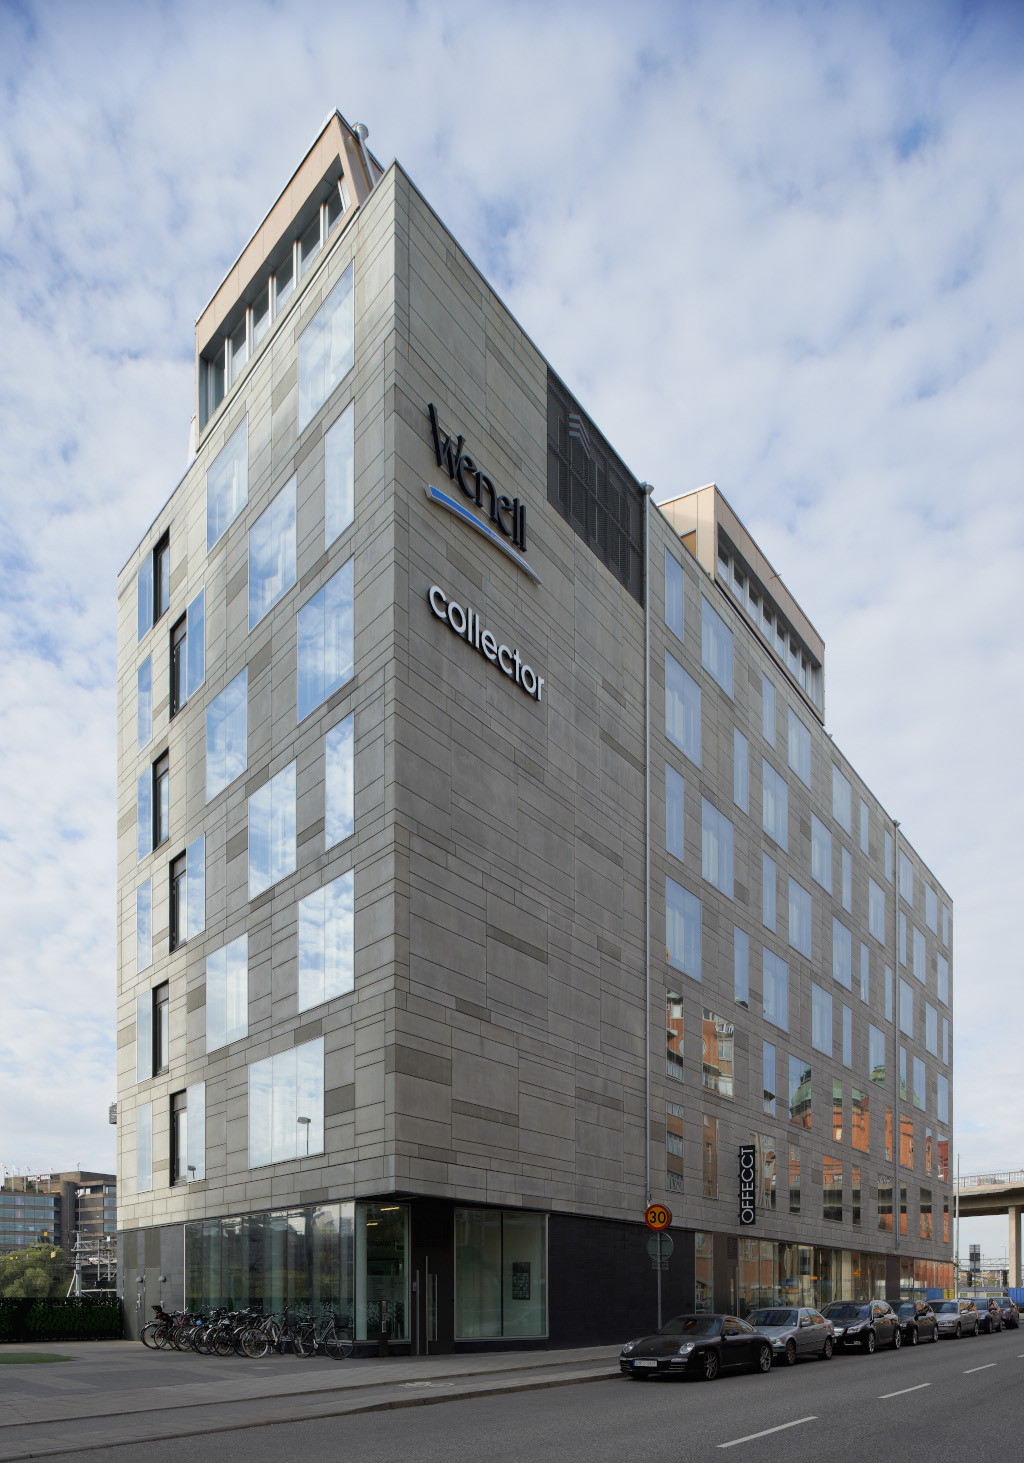 Flat Iron Building / Rosenbergs Arkitekter, © Åke E:son Lindman